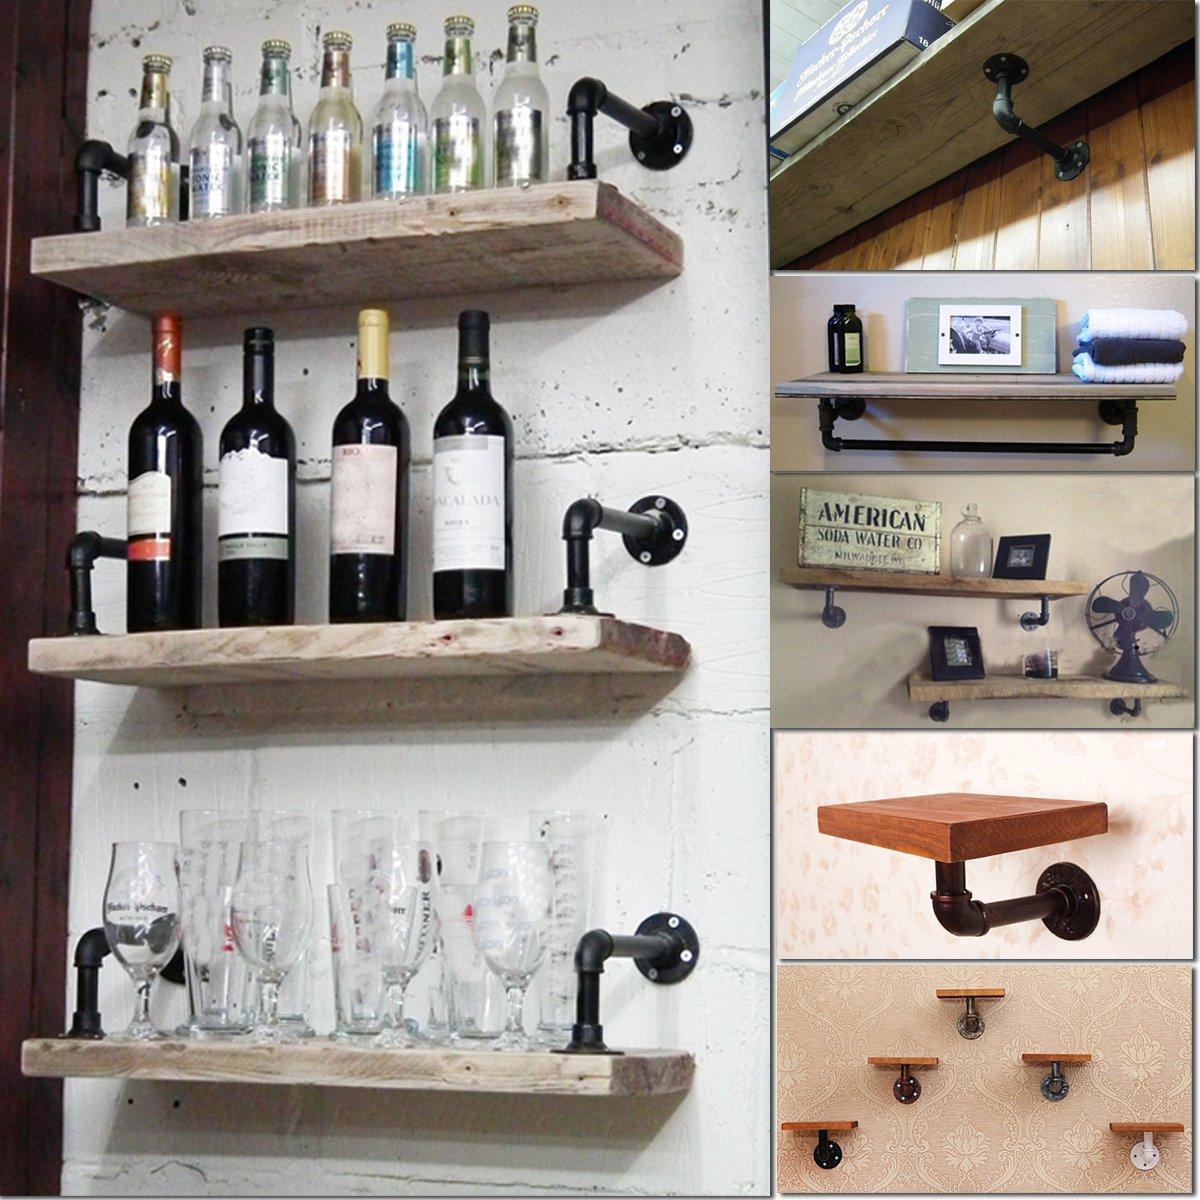 KINGSO 2Pcs Industrial Black Iron Pipe Bracket Wall Mounted Floating Shelf Hanging Wall Hardware Decor For Farmhouse Shelving Hardware Heavy Duty